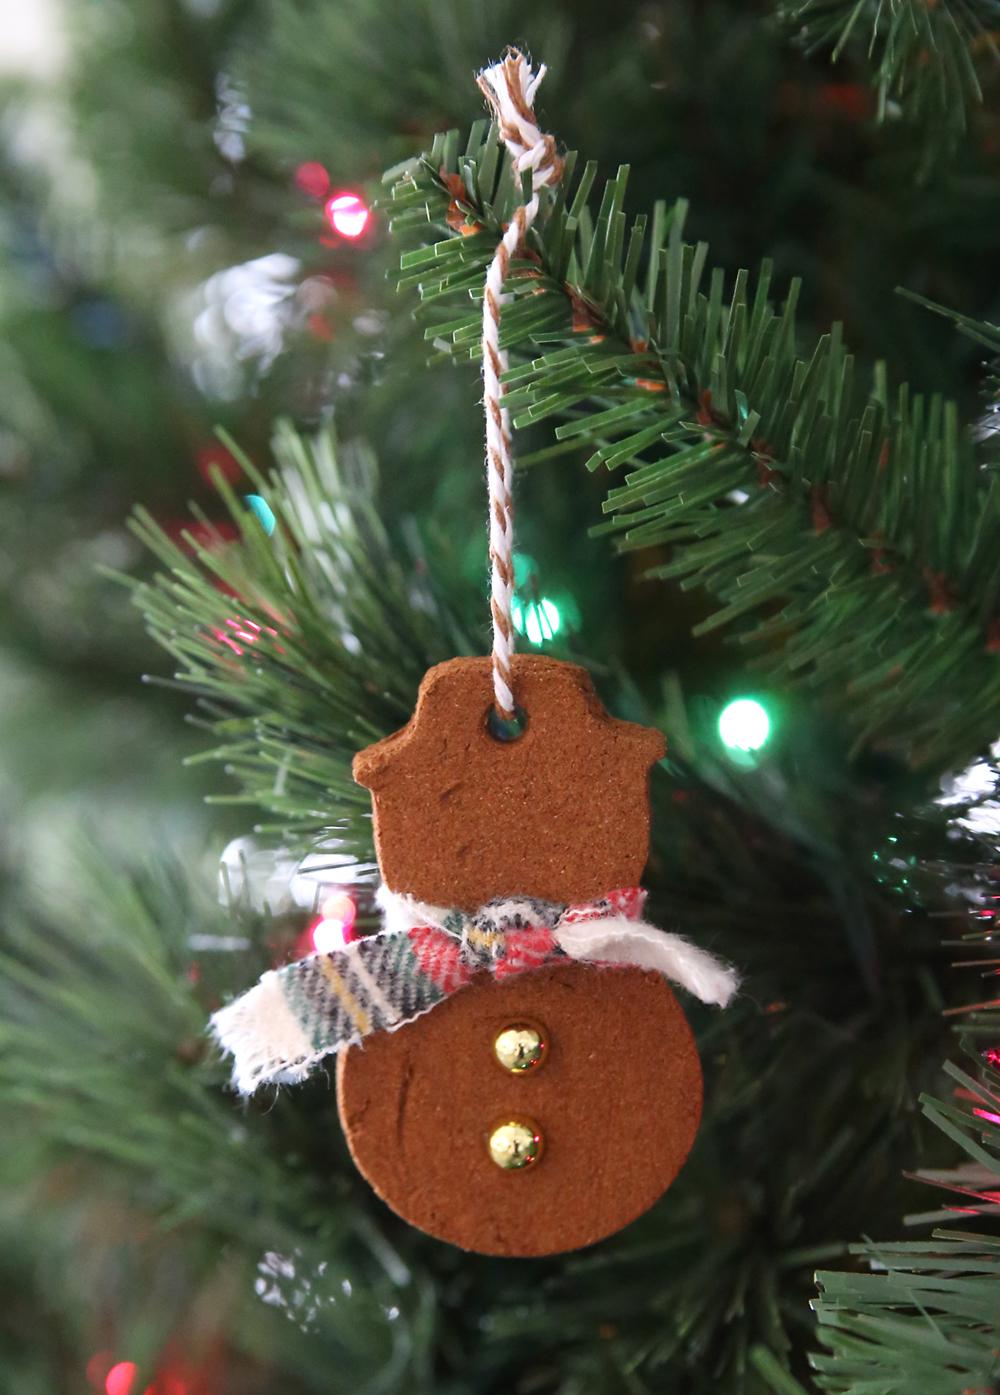 Snowman cinnamon ornament hanging on a Christmas tree.